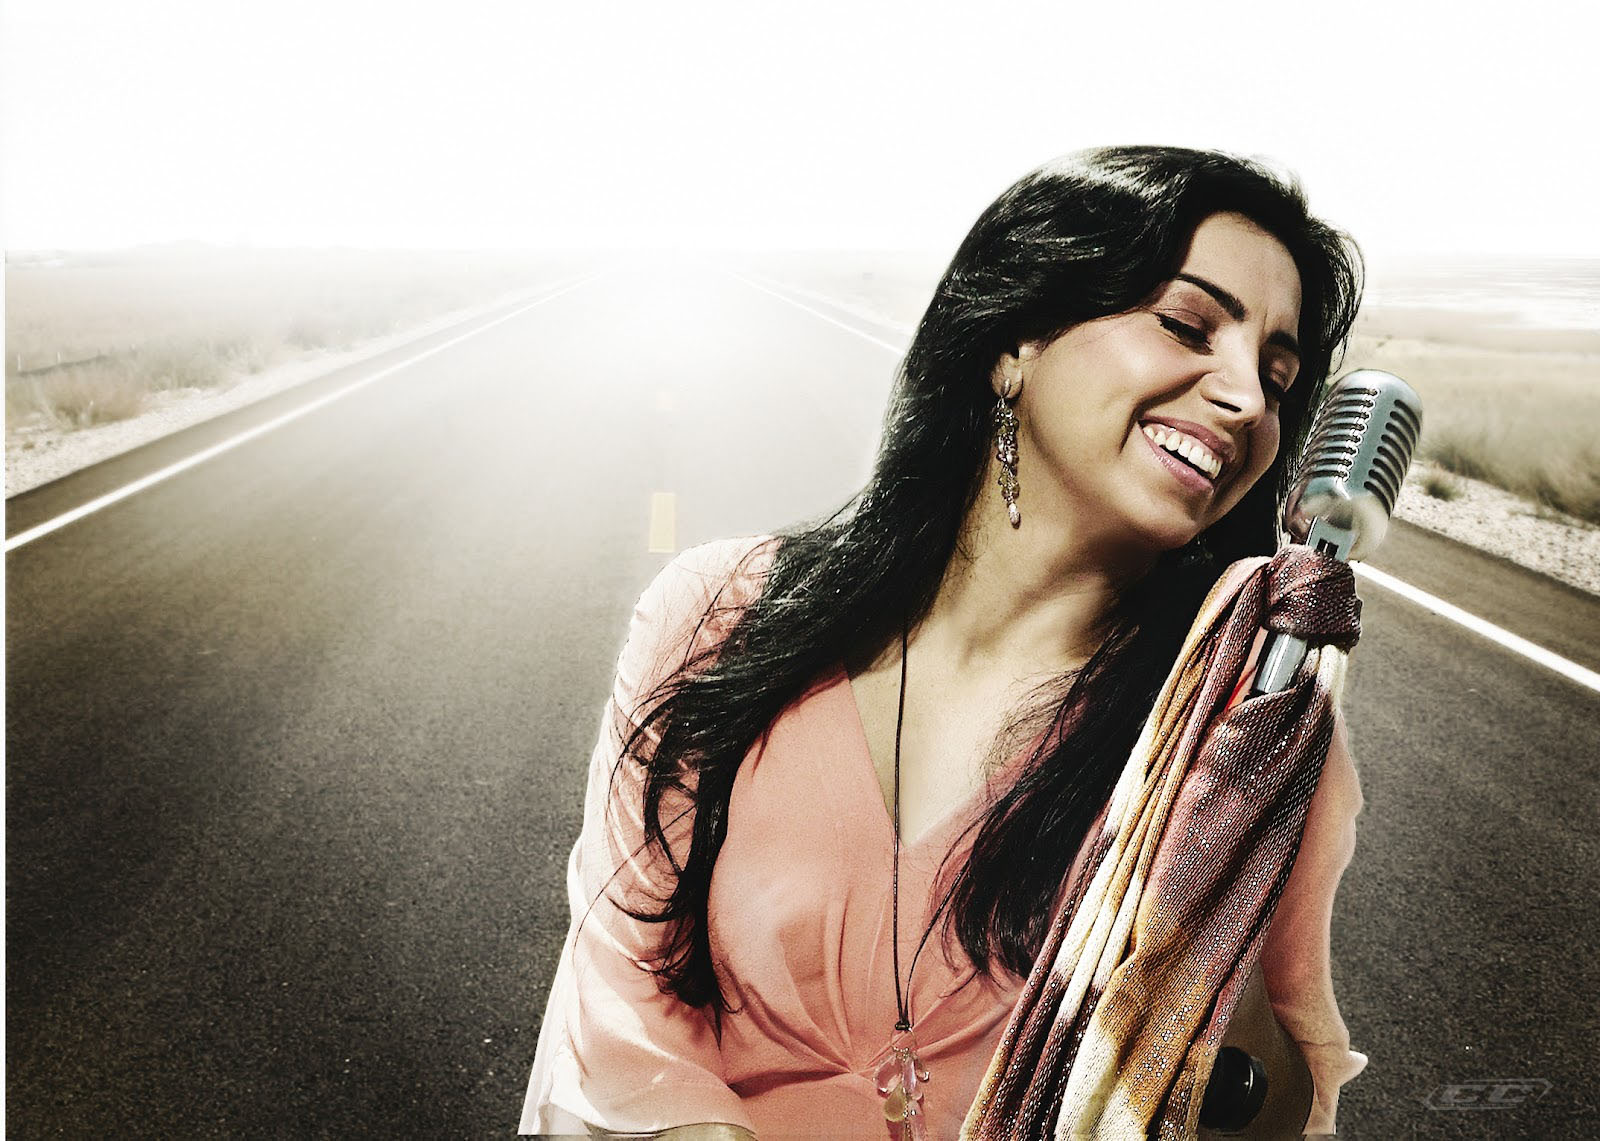 Eyshila - Jesus O Brasil Te Adora 2012 Tracklisting and lyrics